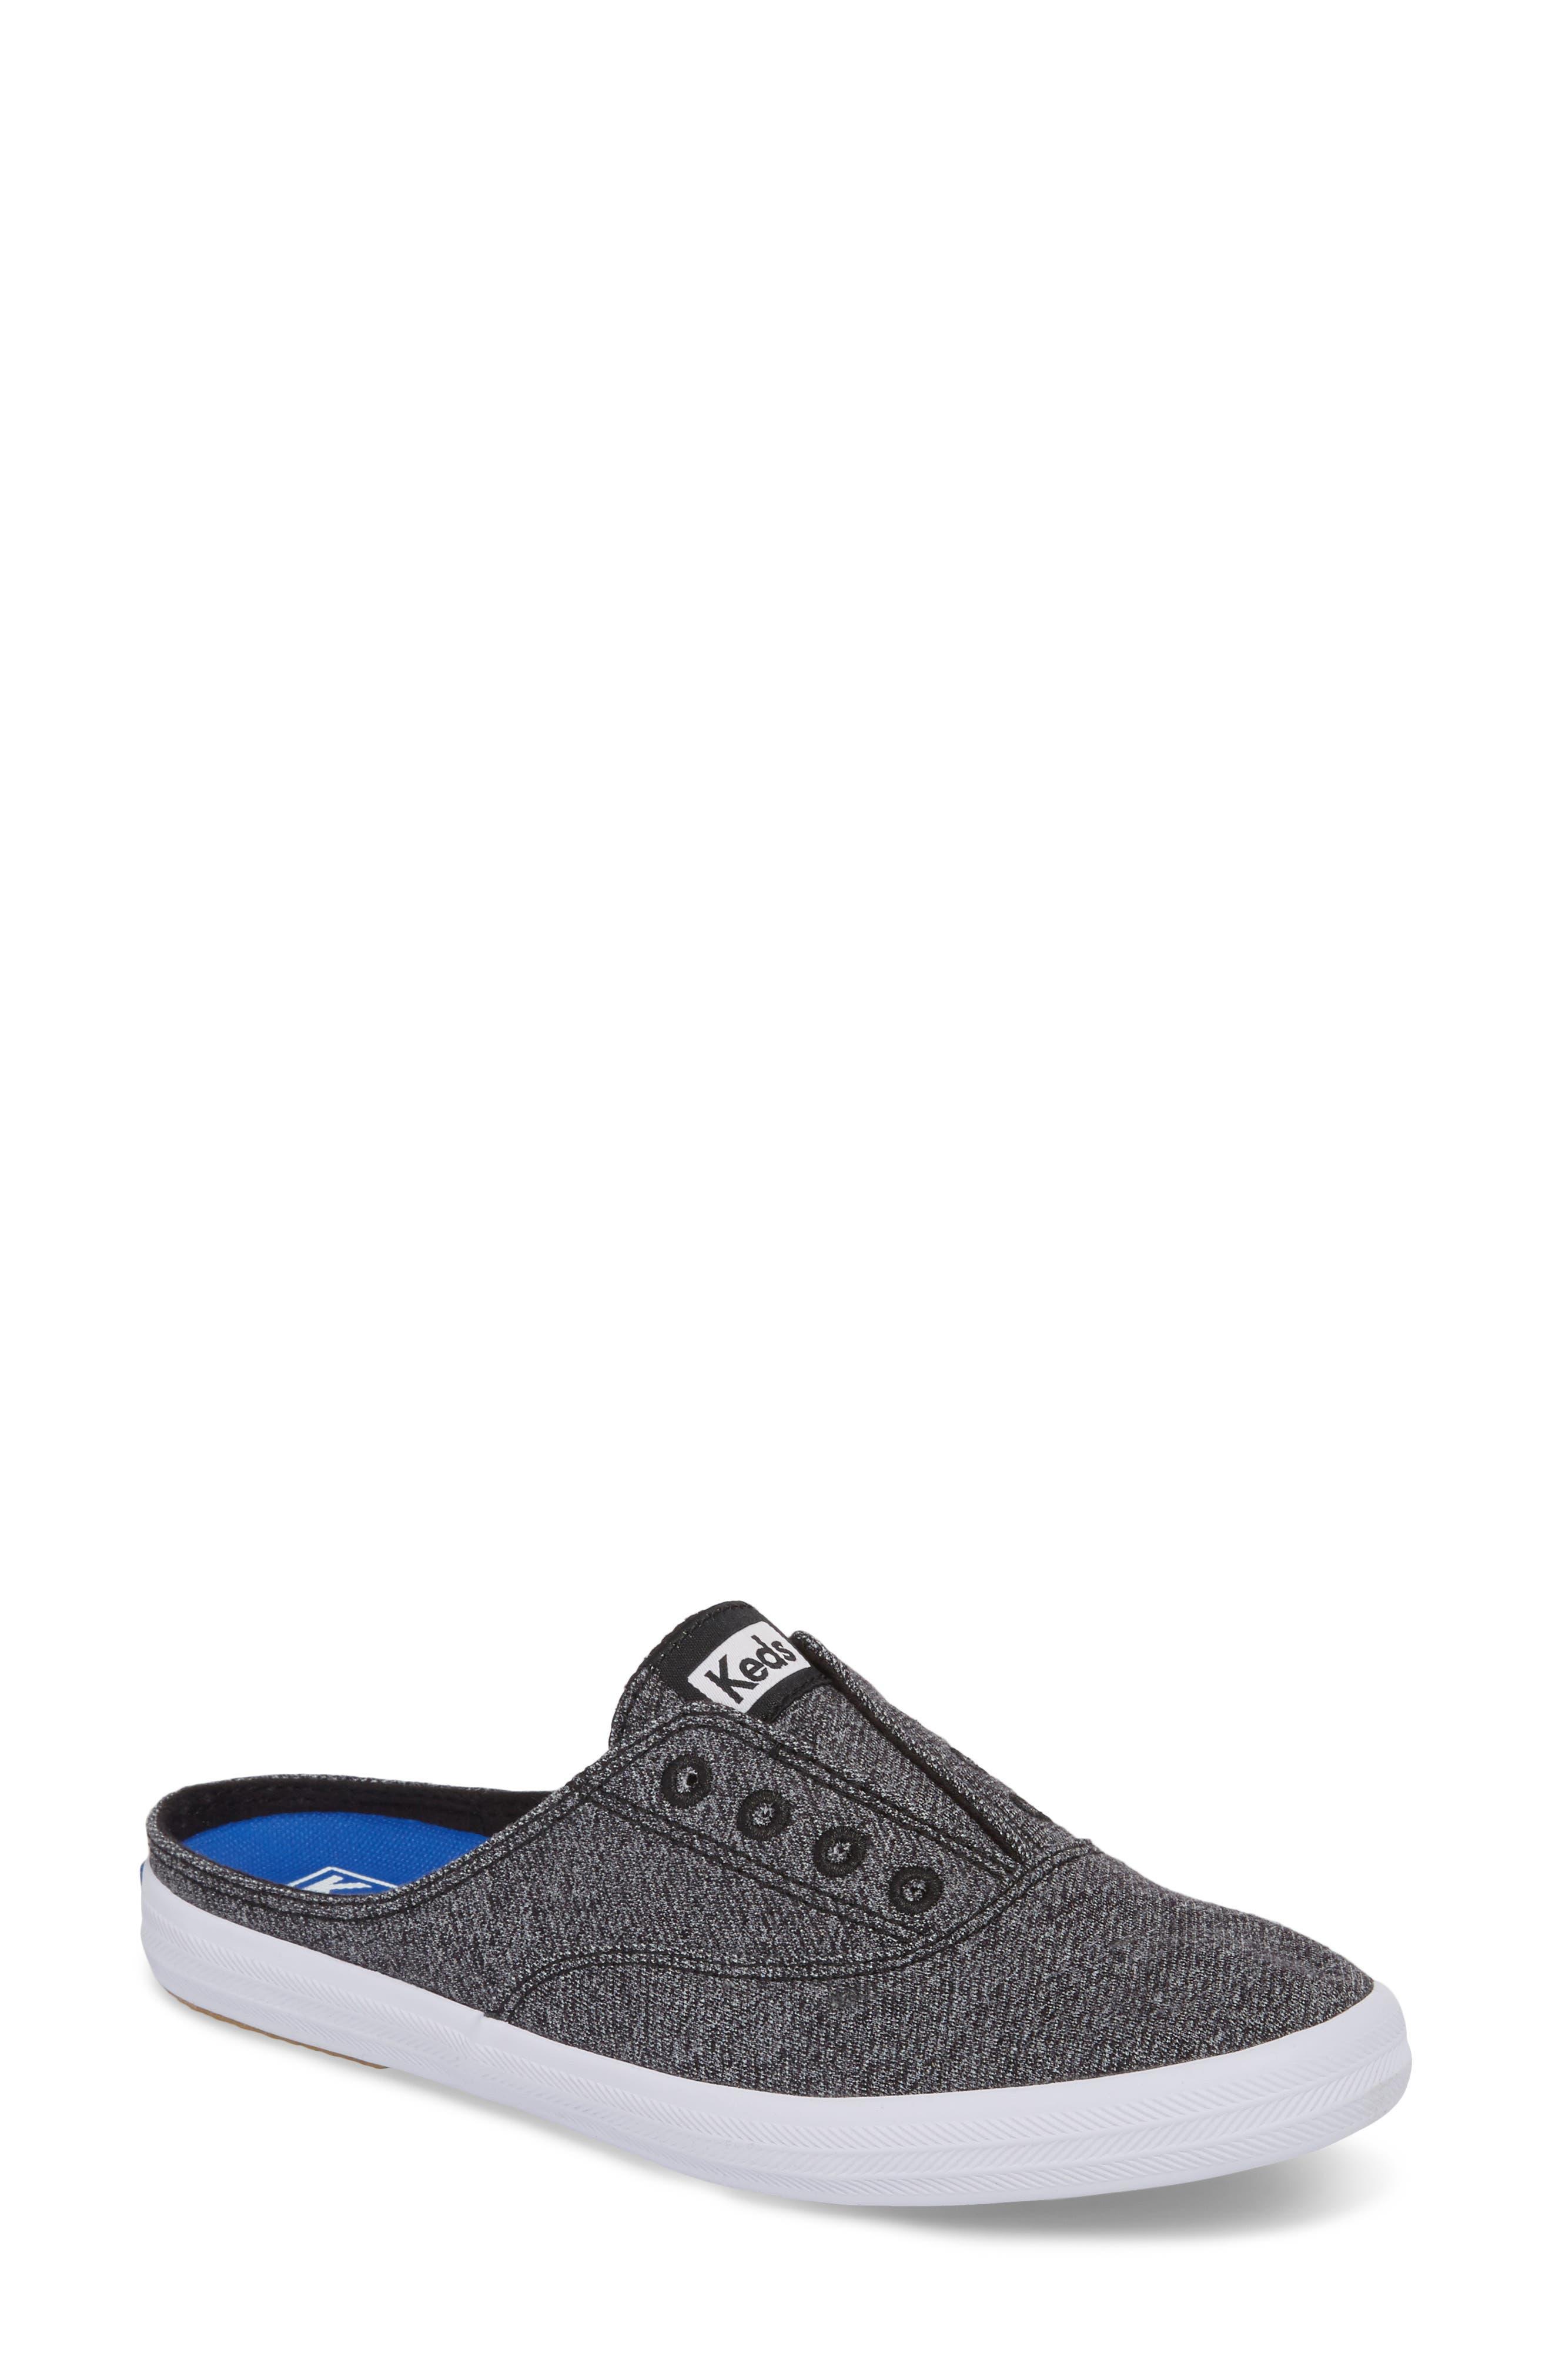 Moxie Sneaker Mule,                             Main thumbnail 1, color,                             021